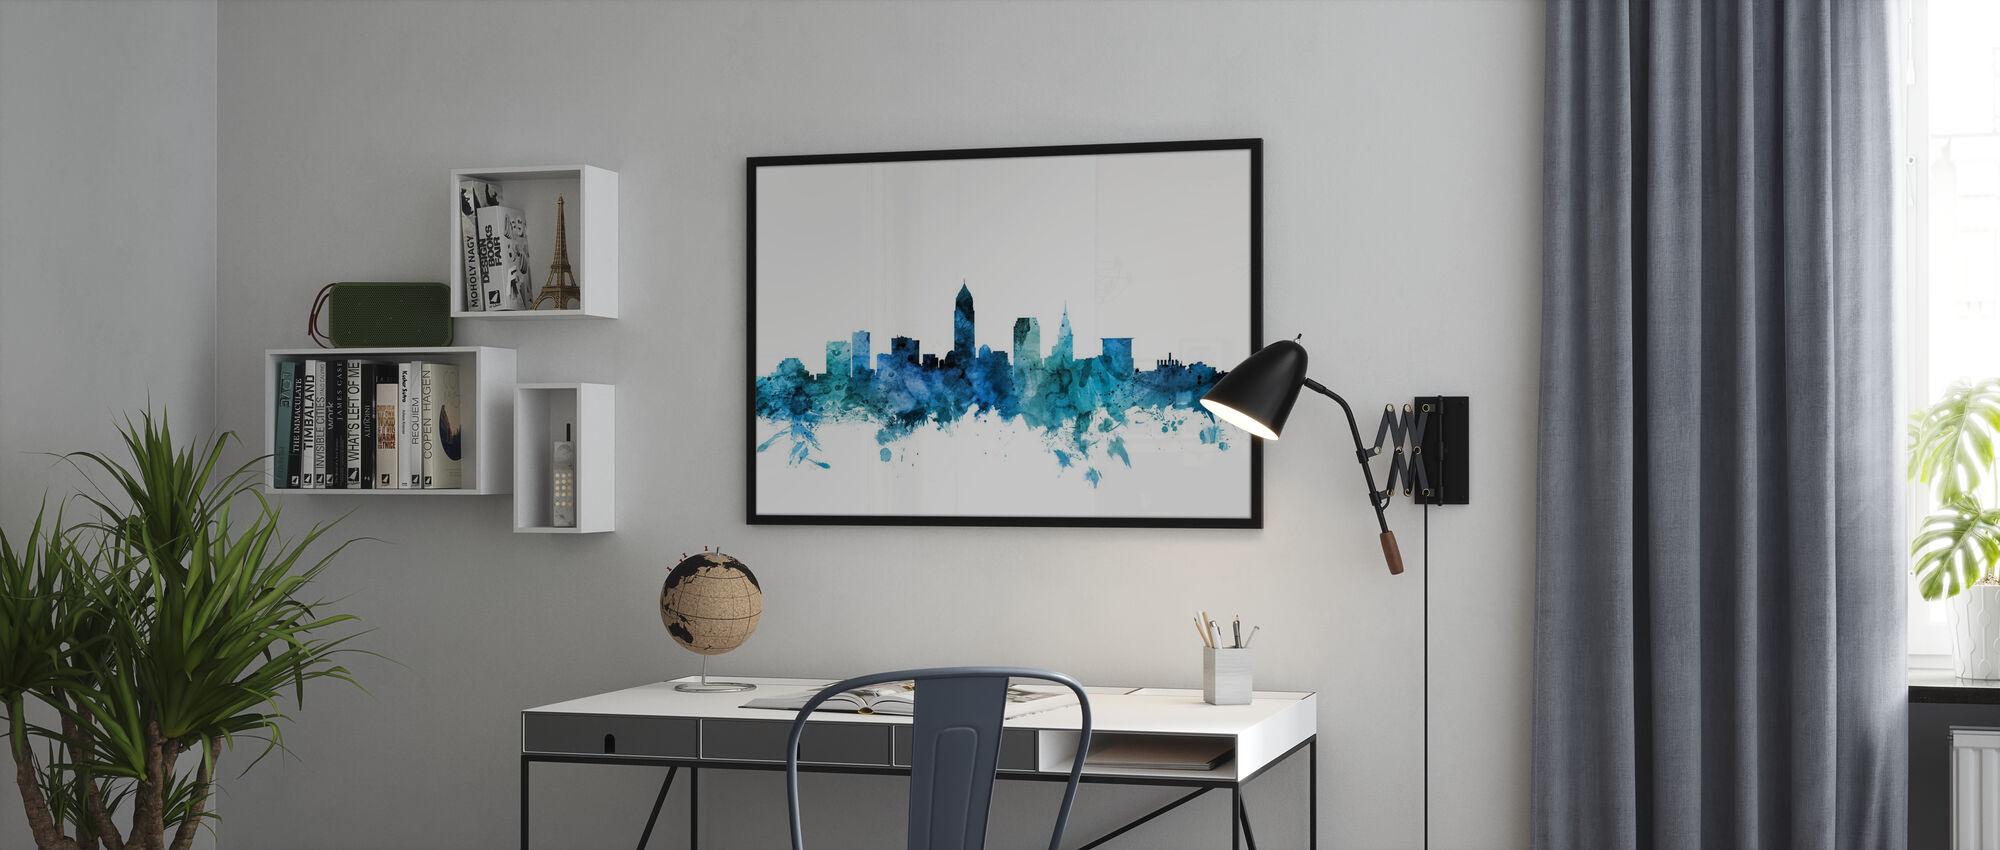 Cleveland Ohio Skyline - Plakat - Kontor